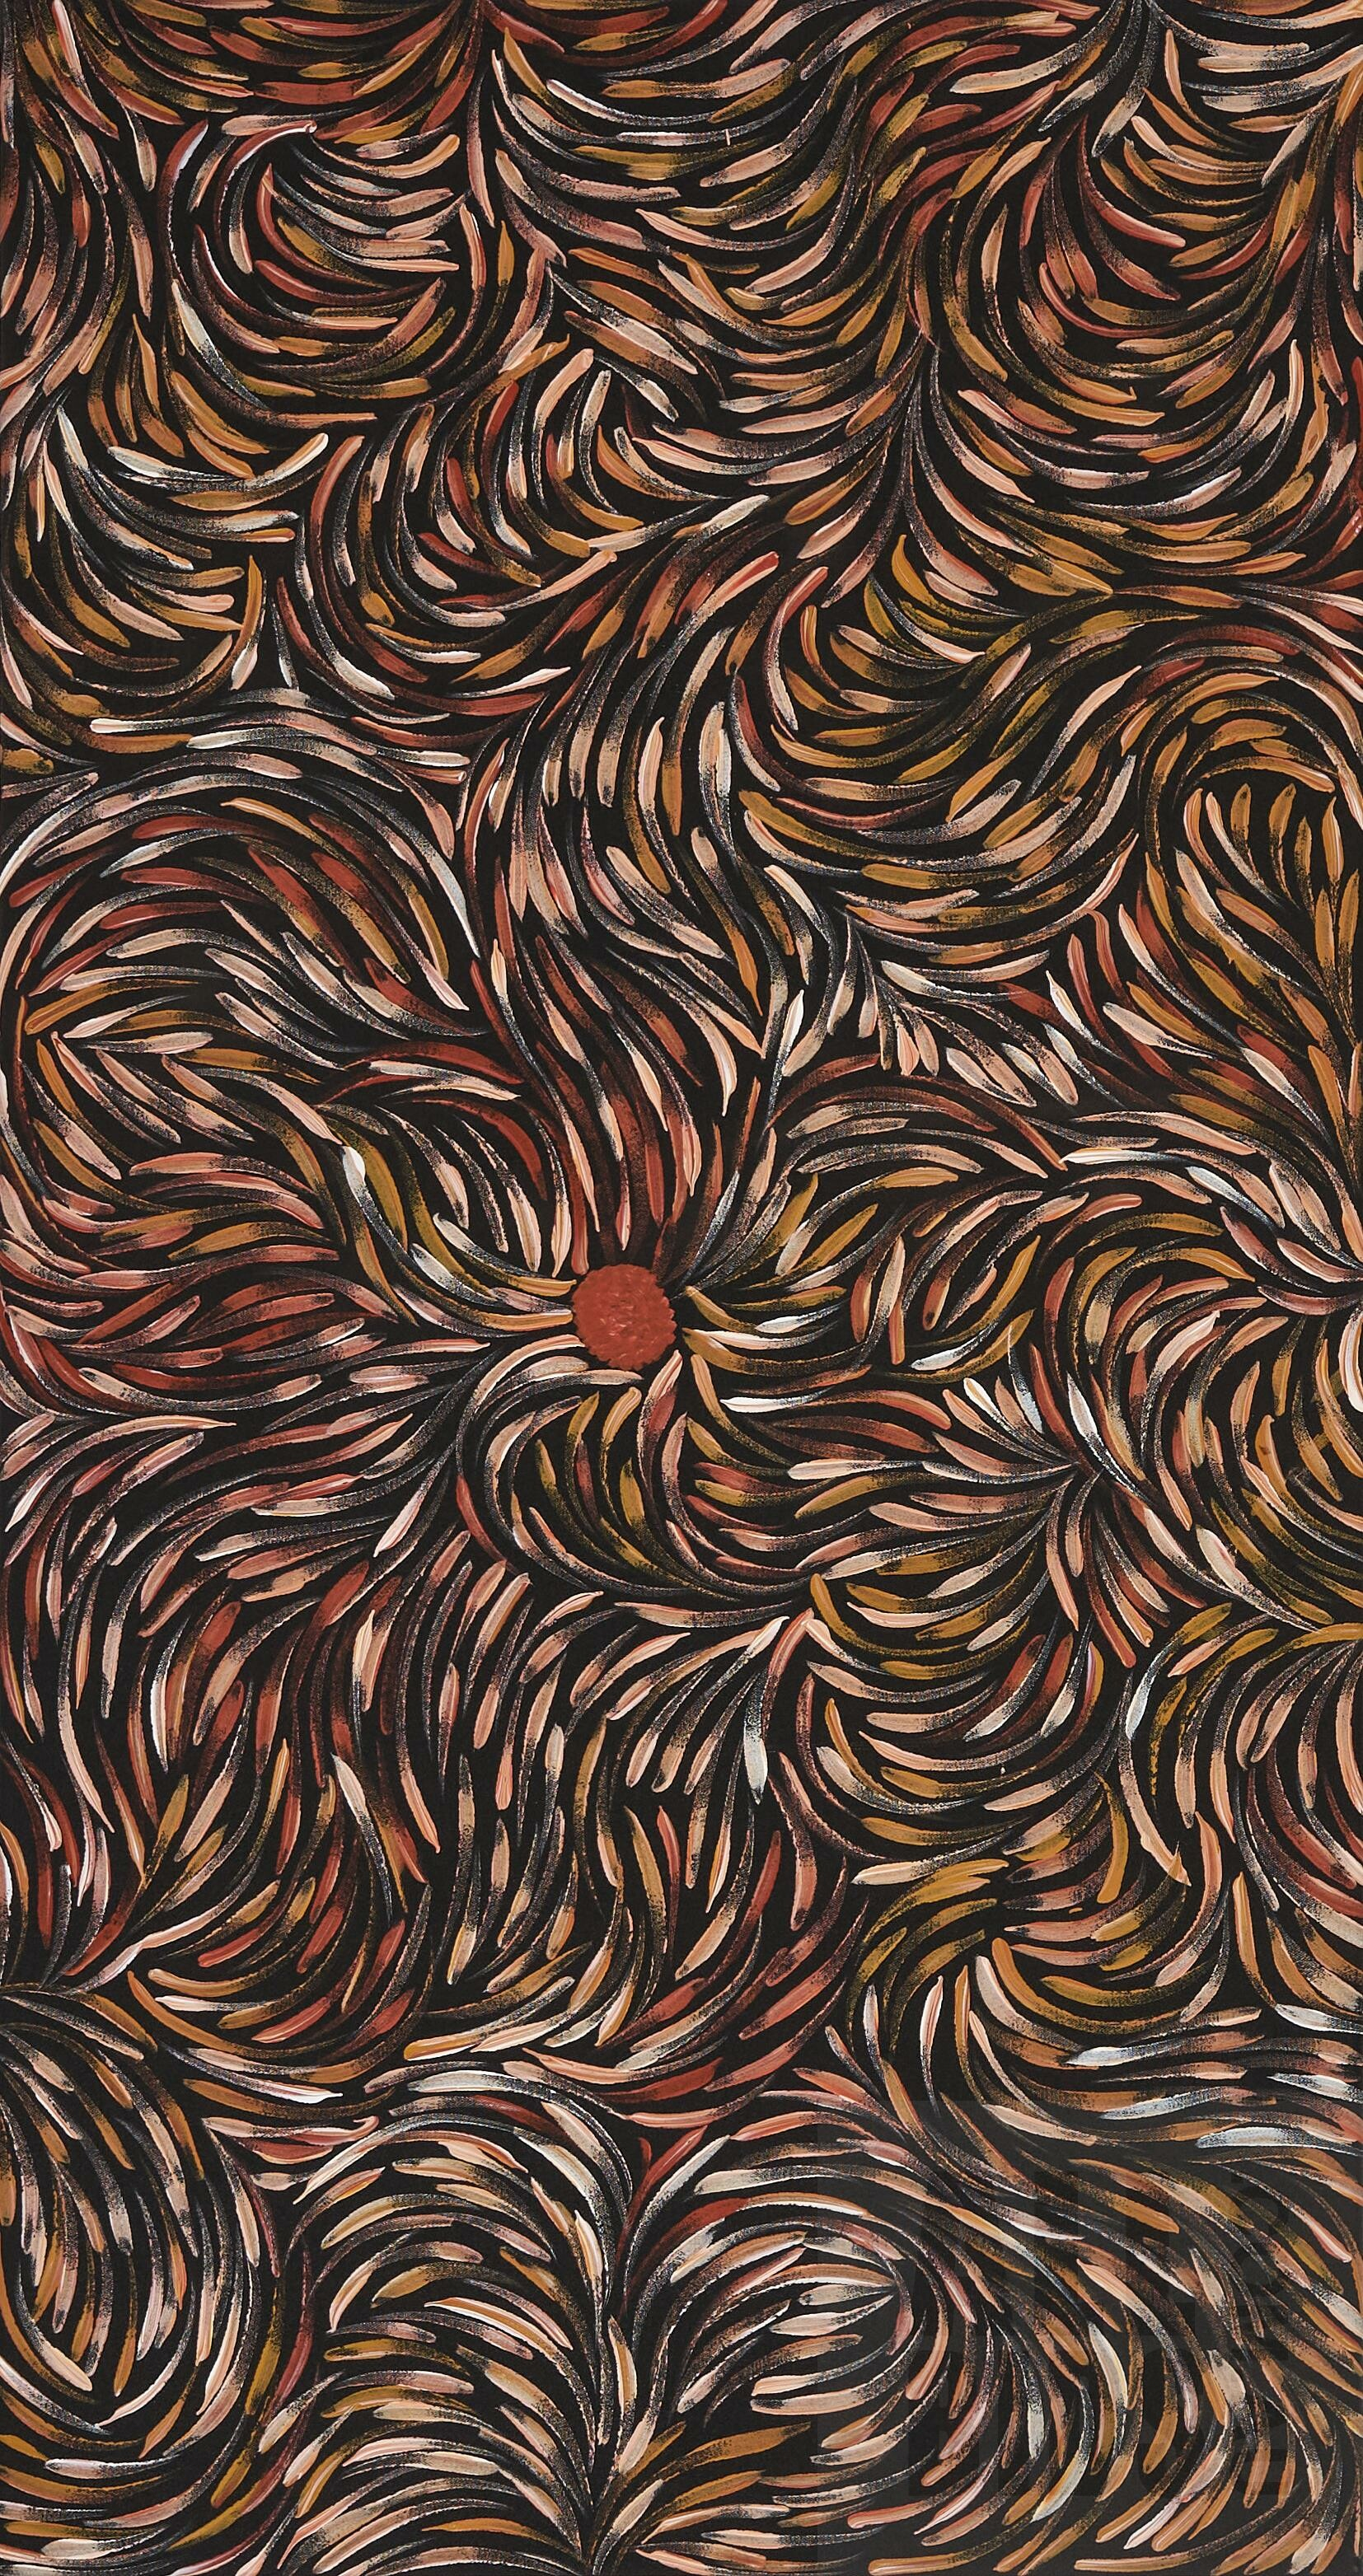 'Roseanne Morton Petyarre (born 1984), Bush Medicine Leaves, Acrylic on Canvas, 94 x 50 cm'